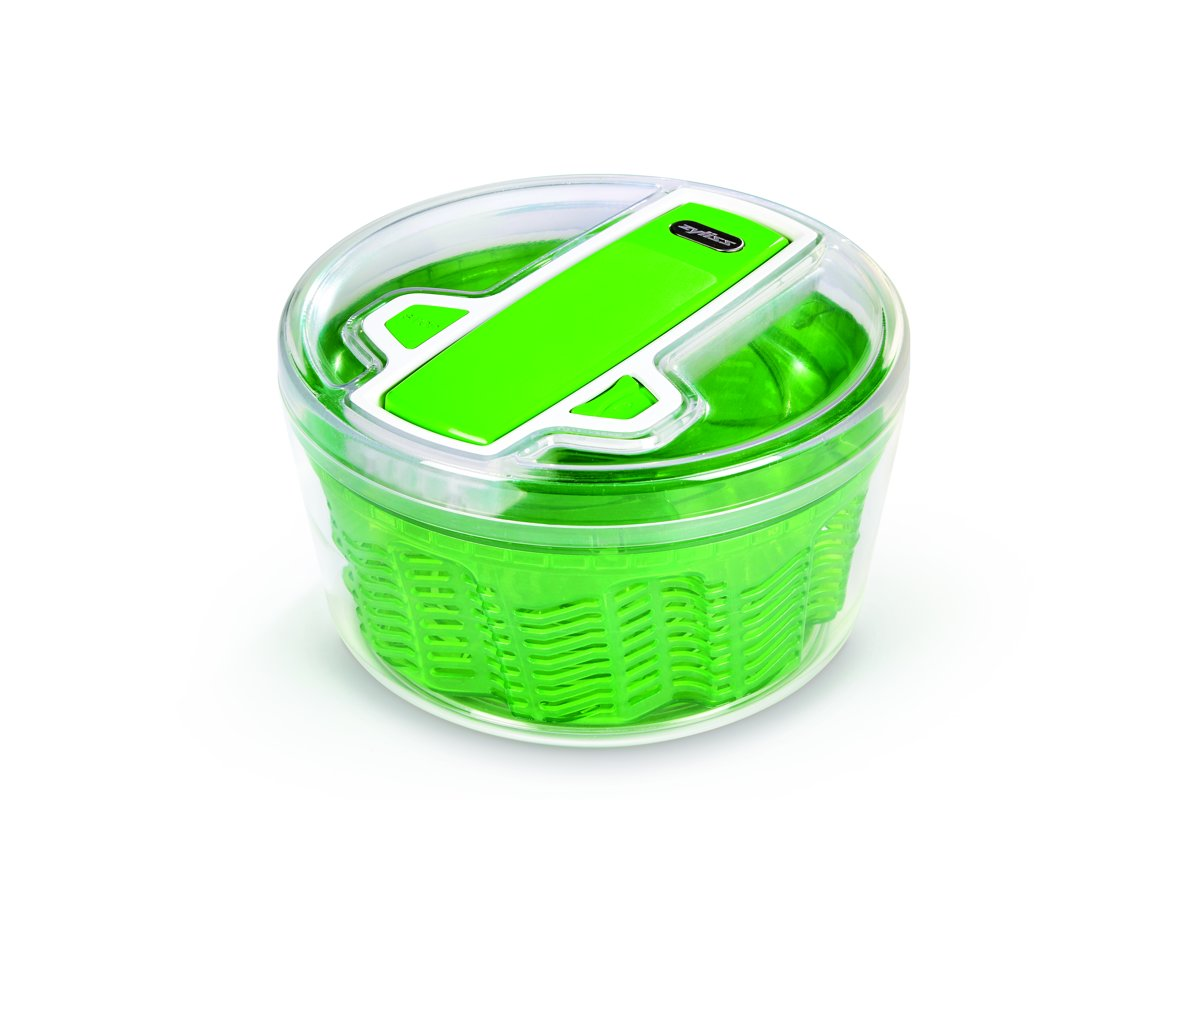 Zyliss E940005 Groen, Transparant slacentrifuge kopen